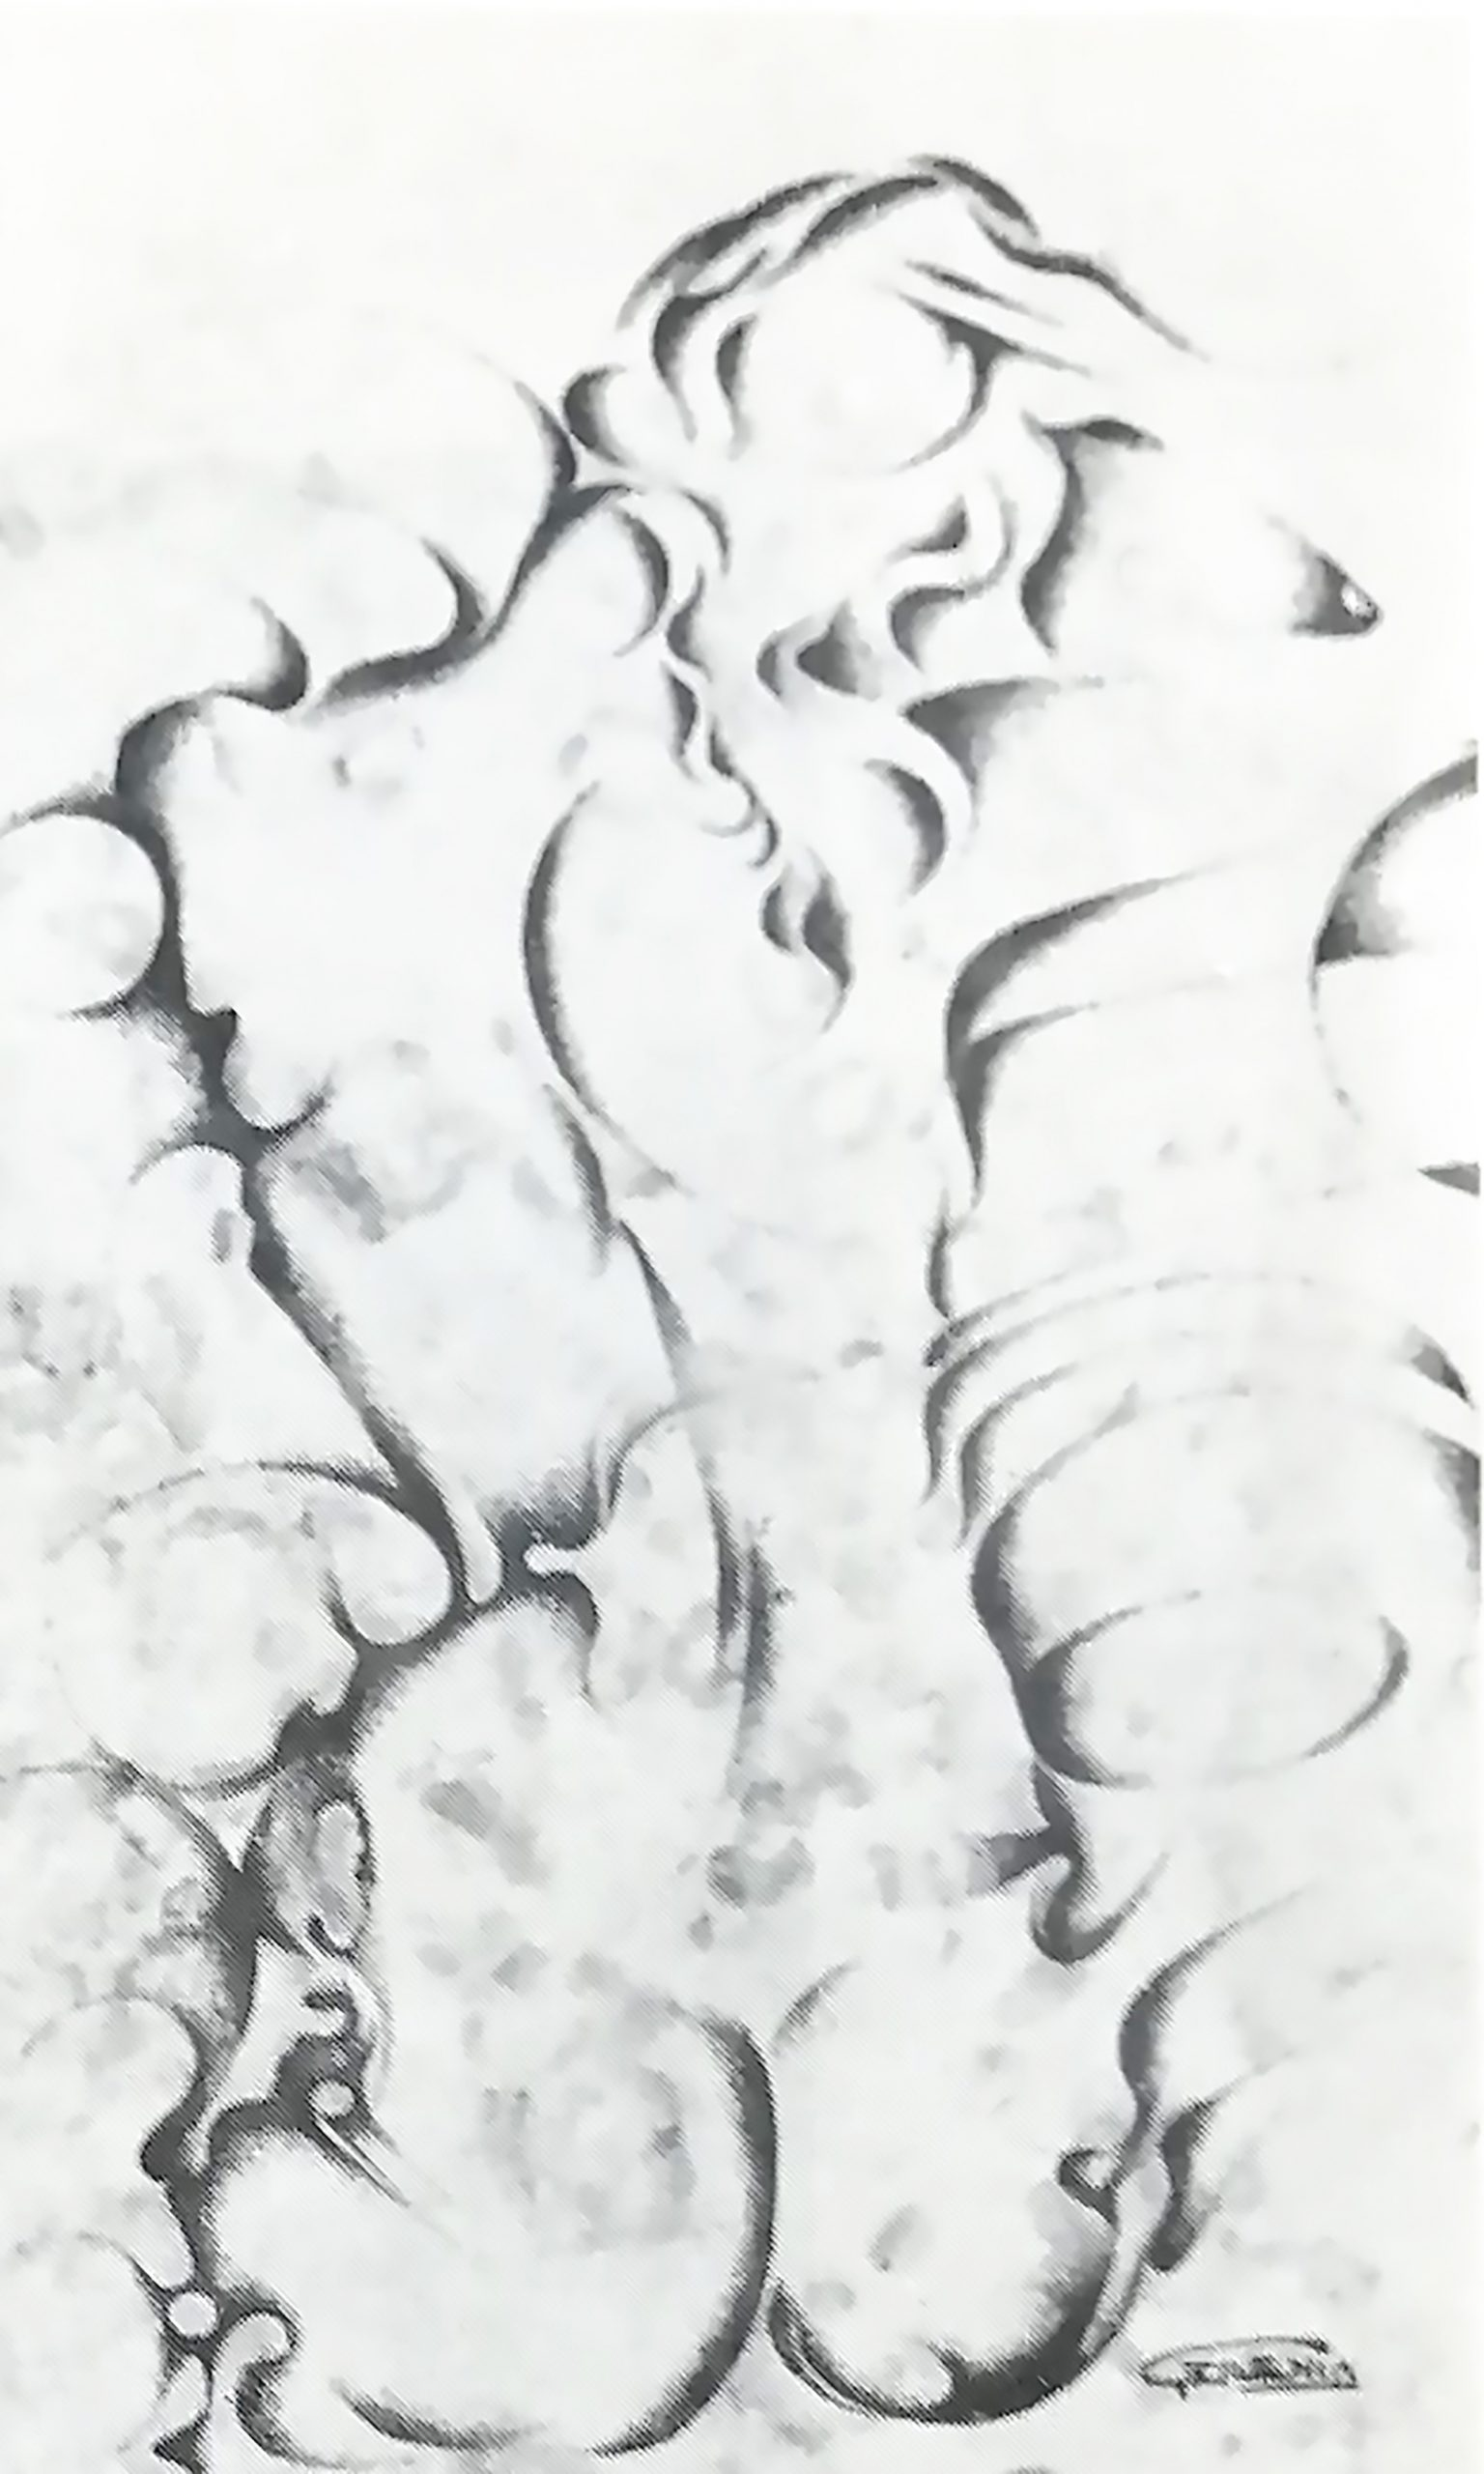 1976 Prometeo Bassano Palazzo Odescalchi Bassano Romano imm scaled - Bibliography/ Catalogues